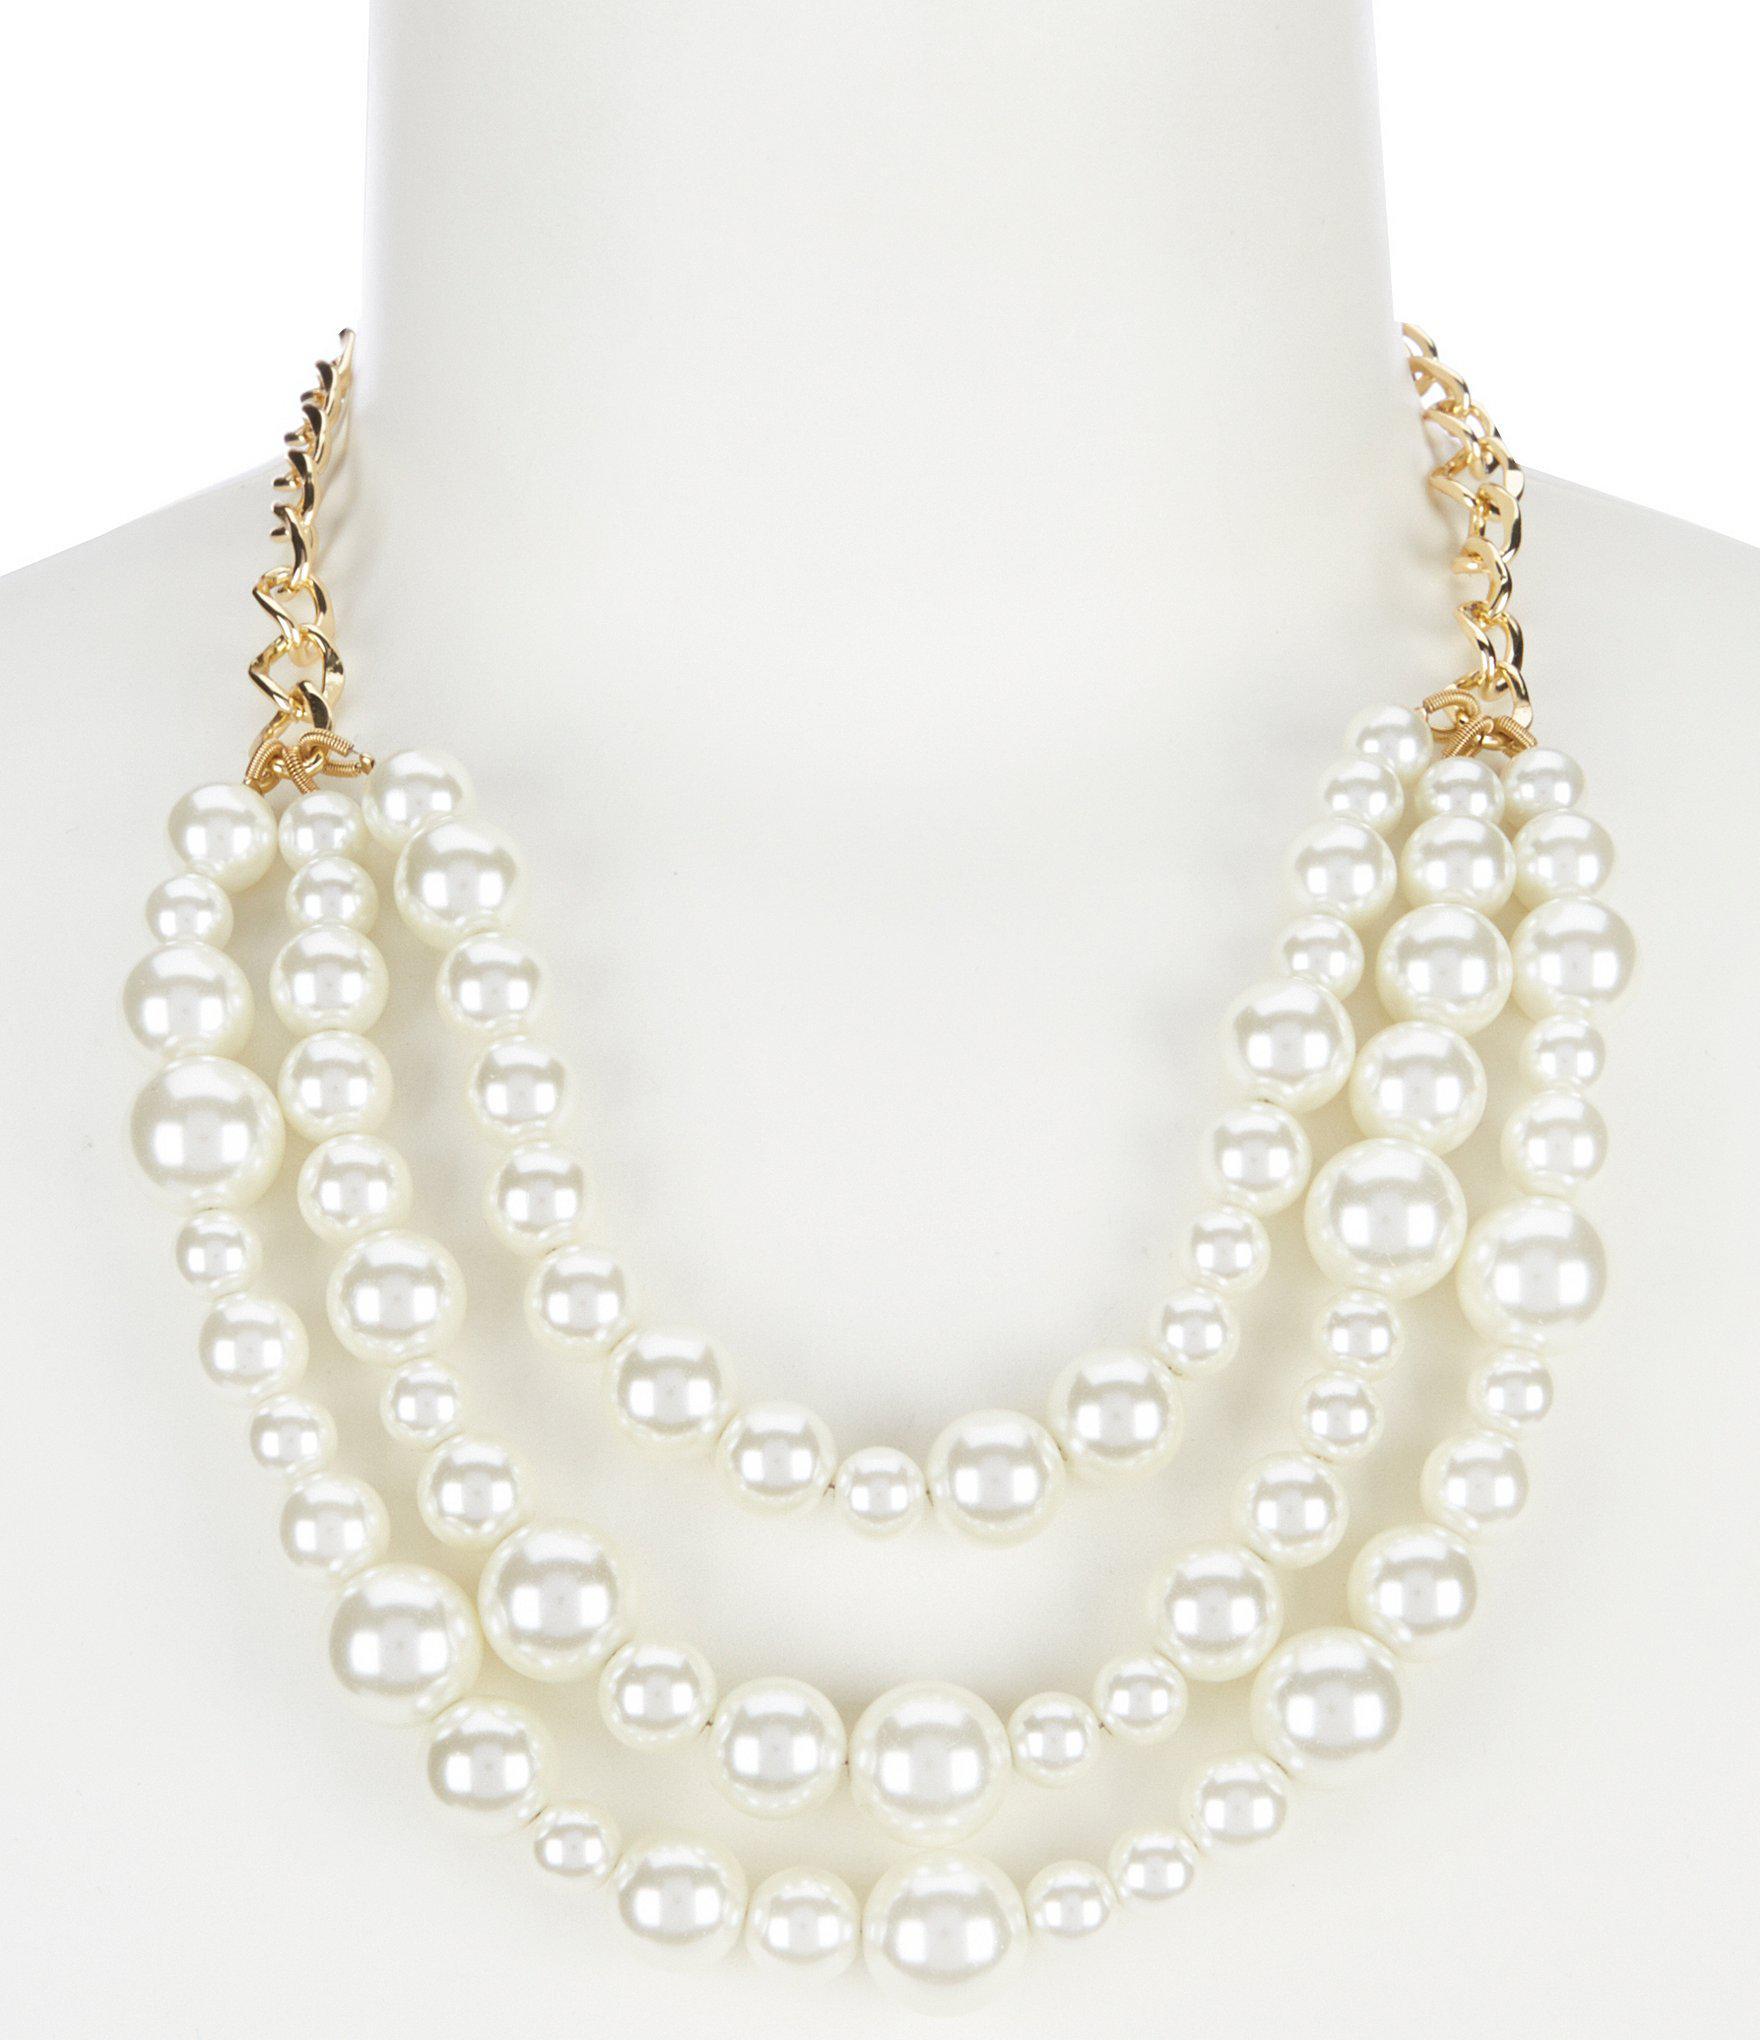 7c22faa05db1c Lyst - Dillard's Tailored Pearl Frontal Necklace in Metallic